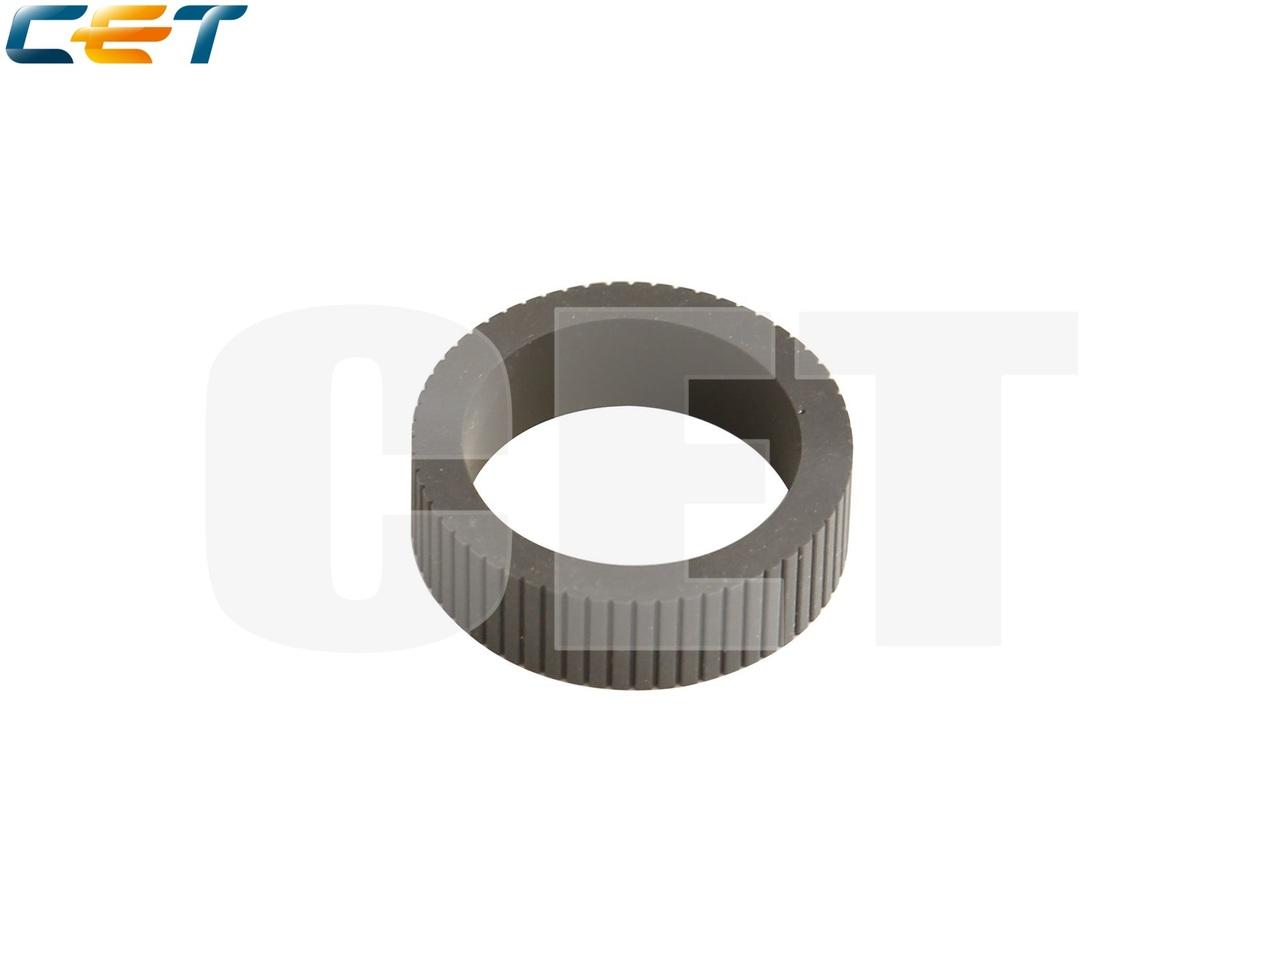 Резинка ролика подхвата PA03670-0002 для FUJITSUfi-7160/7260 (CET), CET341019